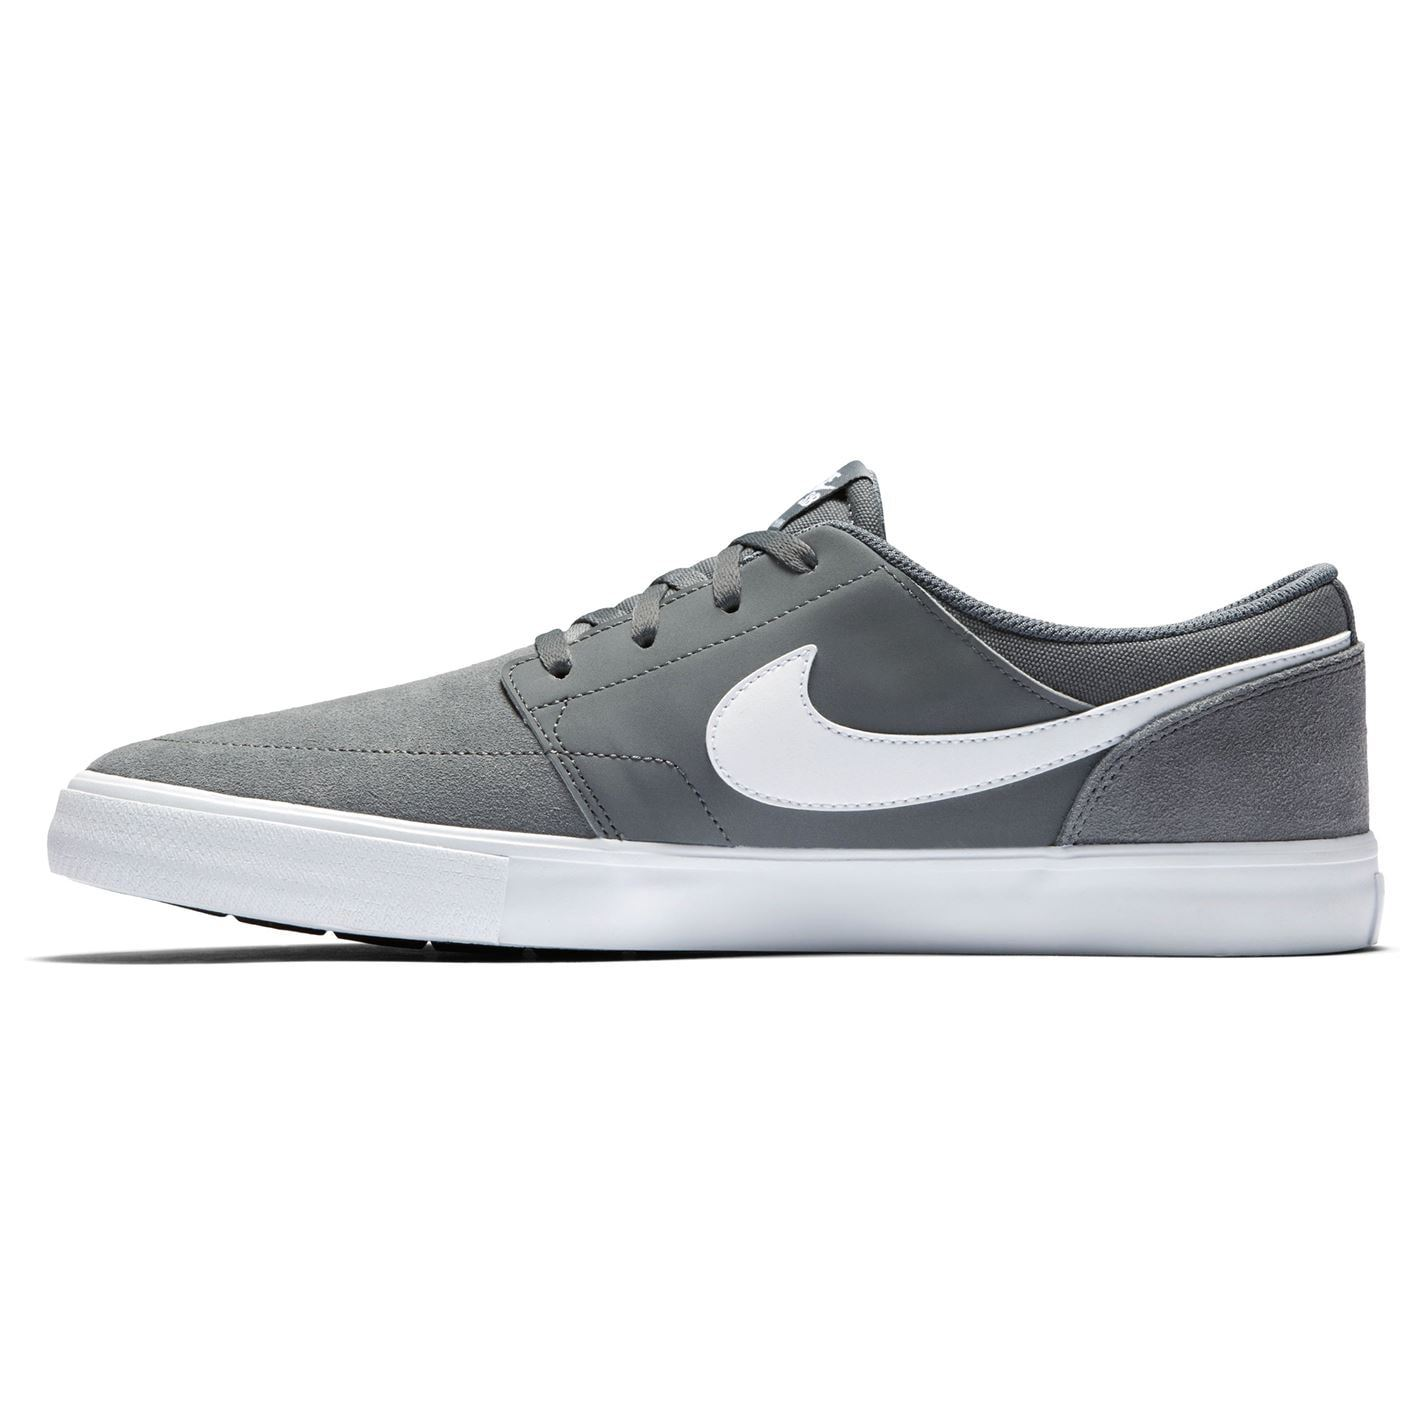 Nike SB Solarsoft Portmore II Skate